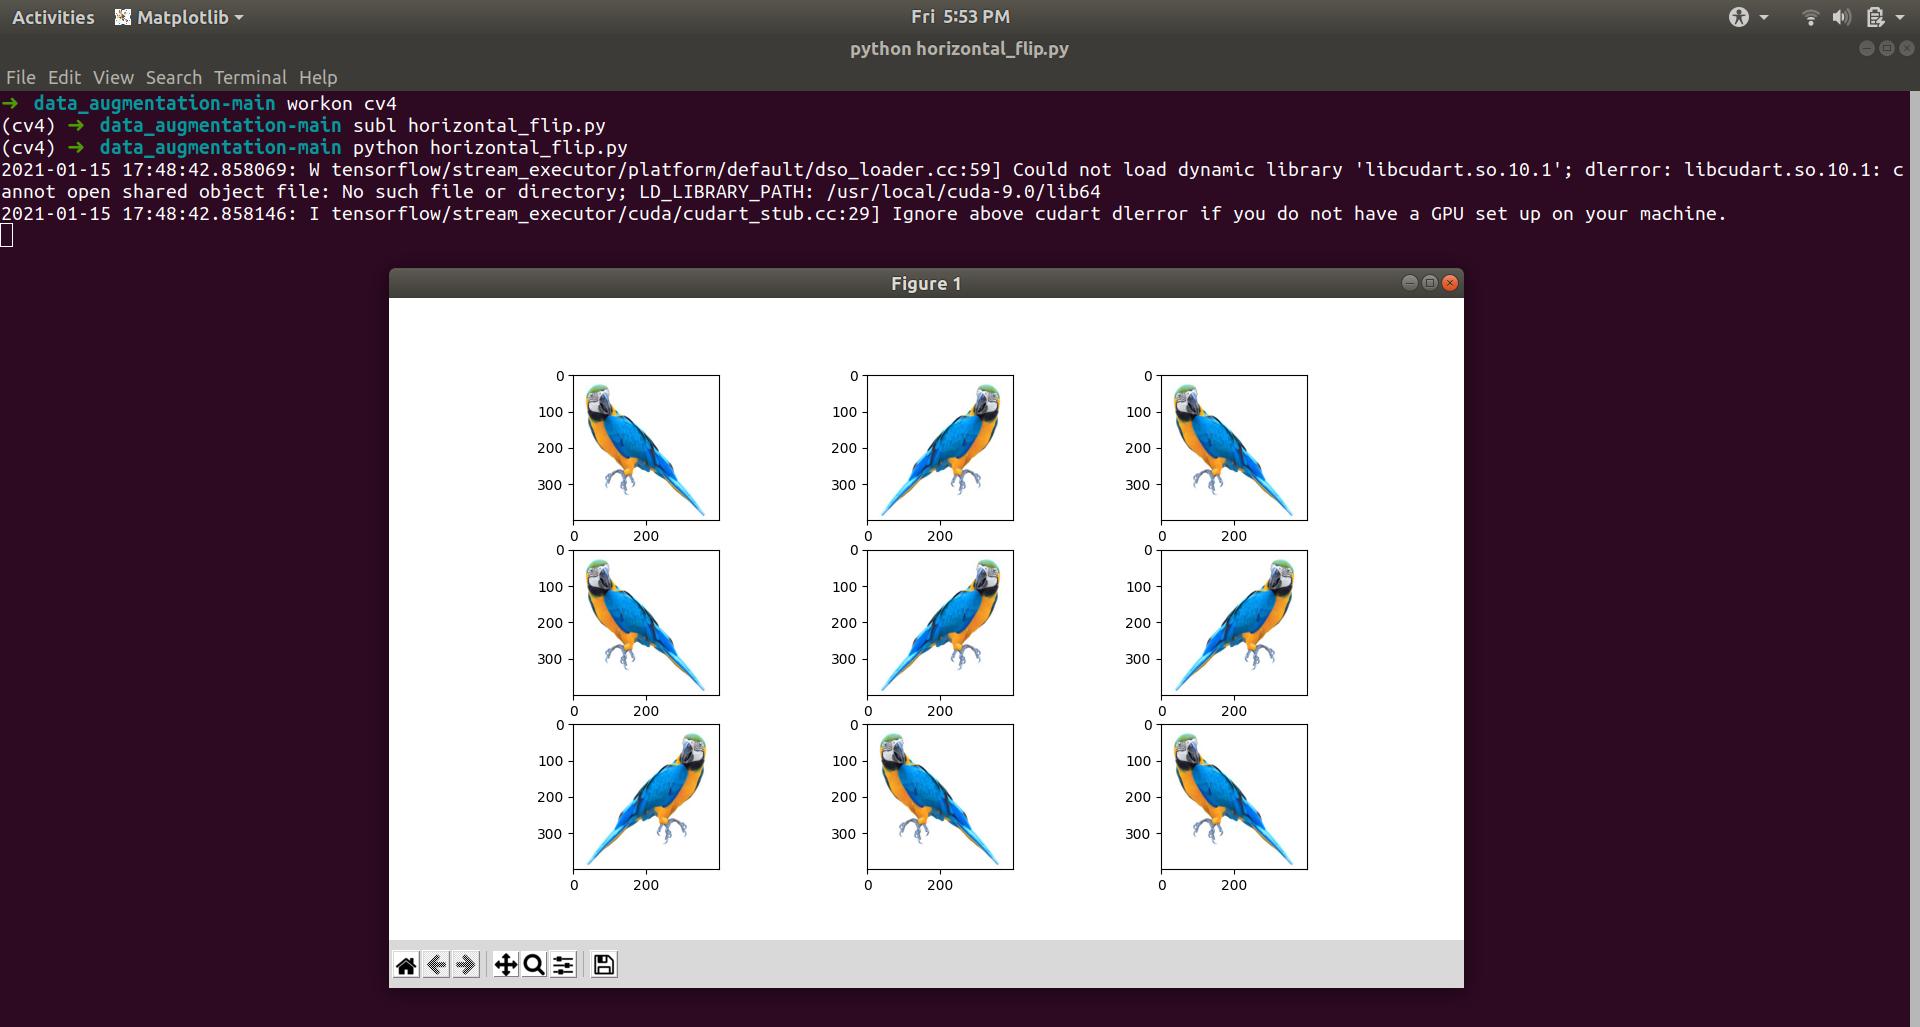 Horizontal Flip Data Augmentation Example